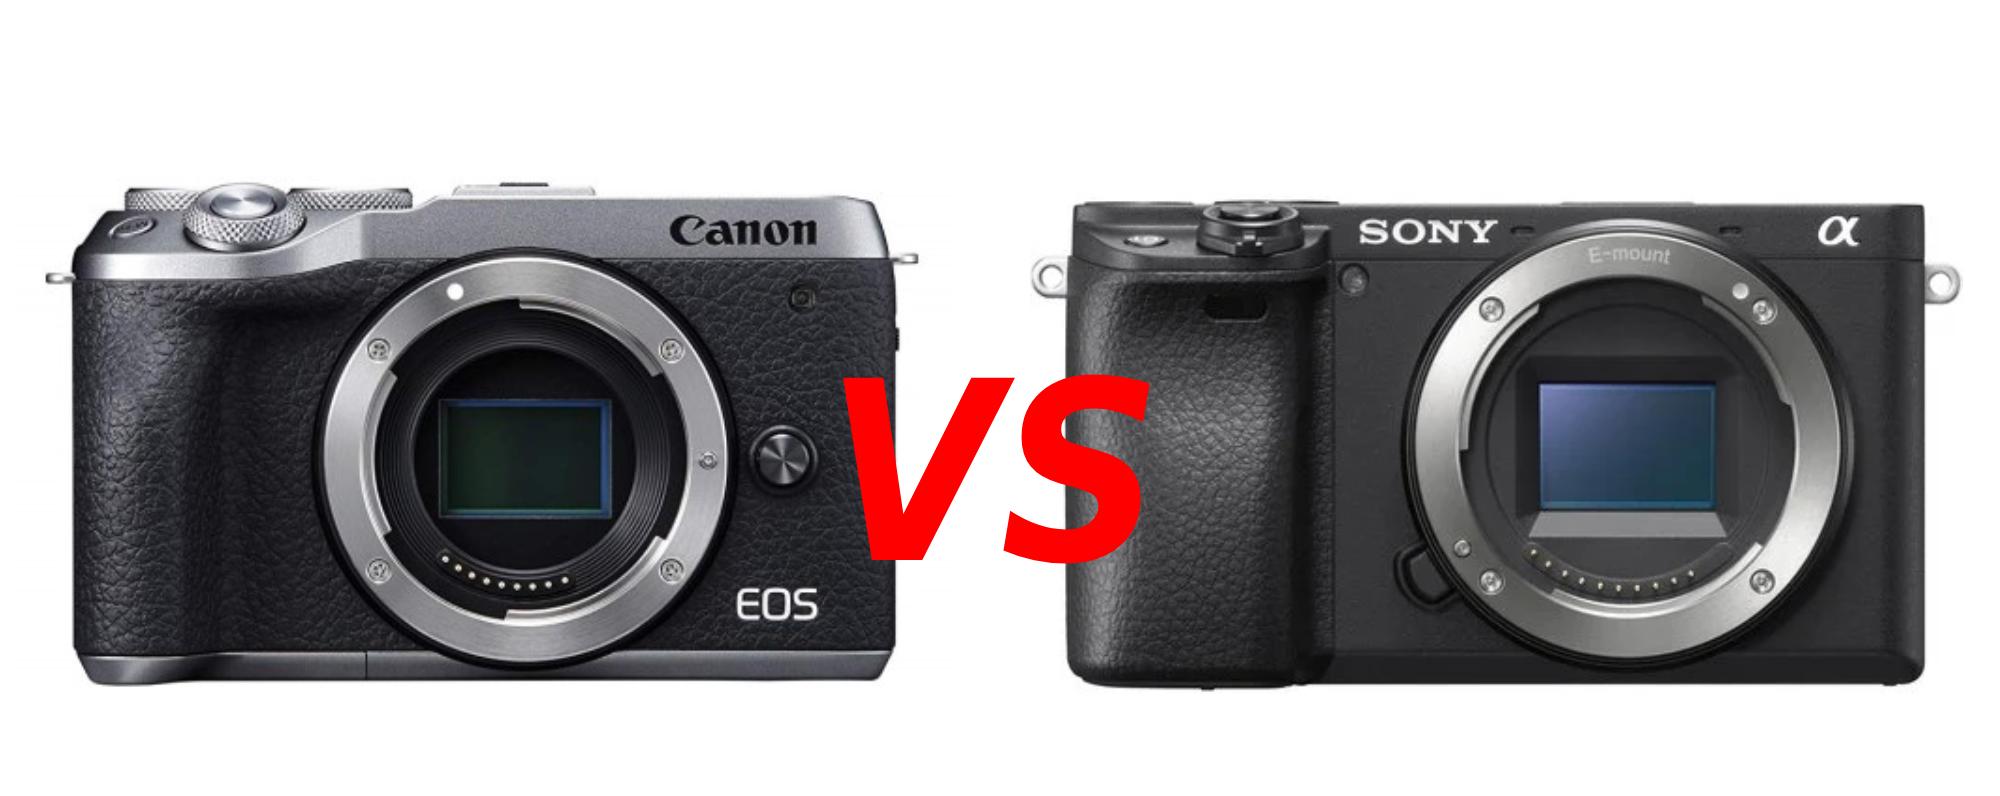 canon eos m6 mark ii vs sony a6400 image